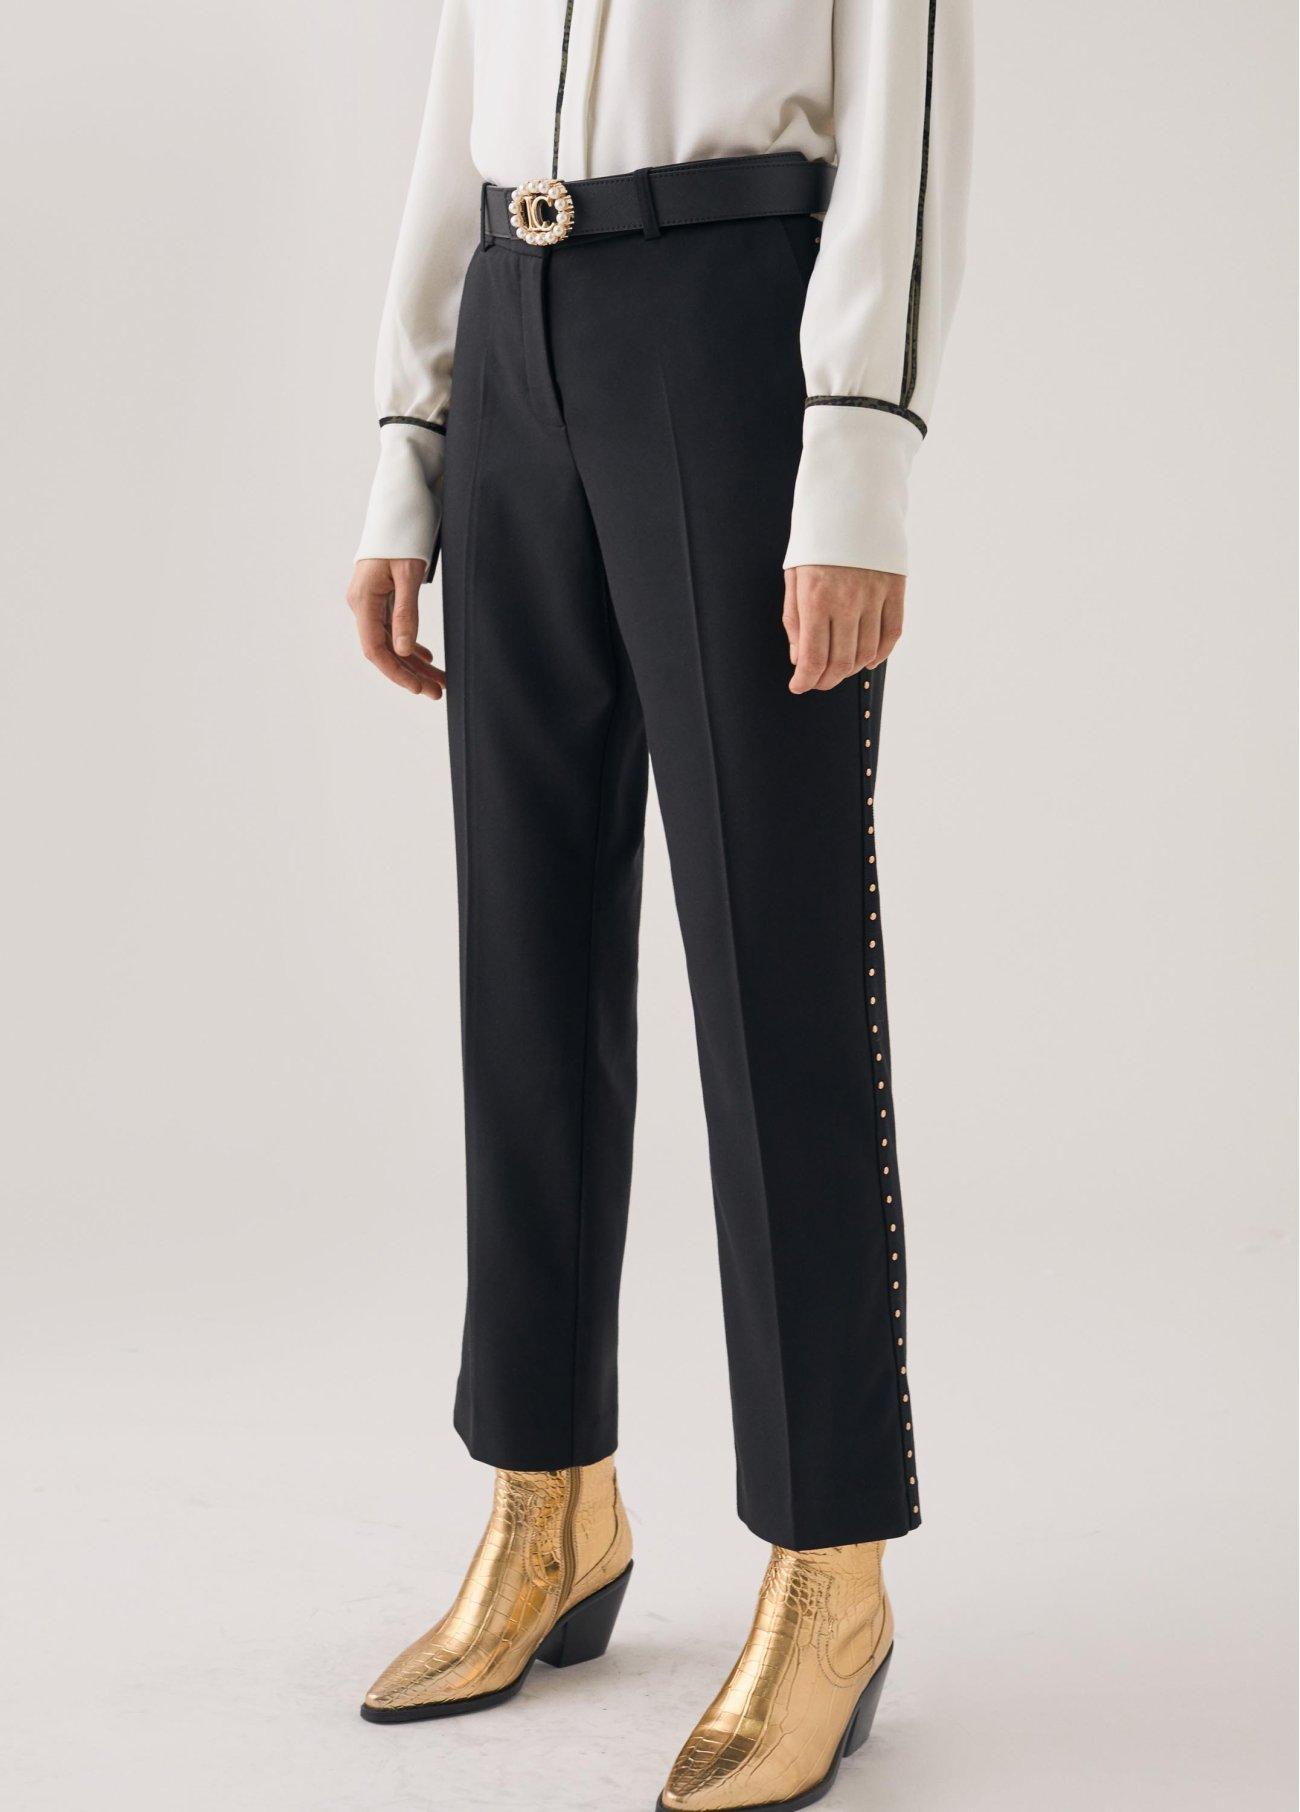 Pantalón con elástico LOVE, blanco, negro